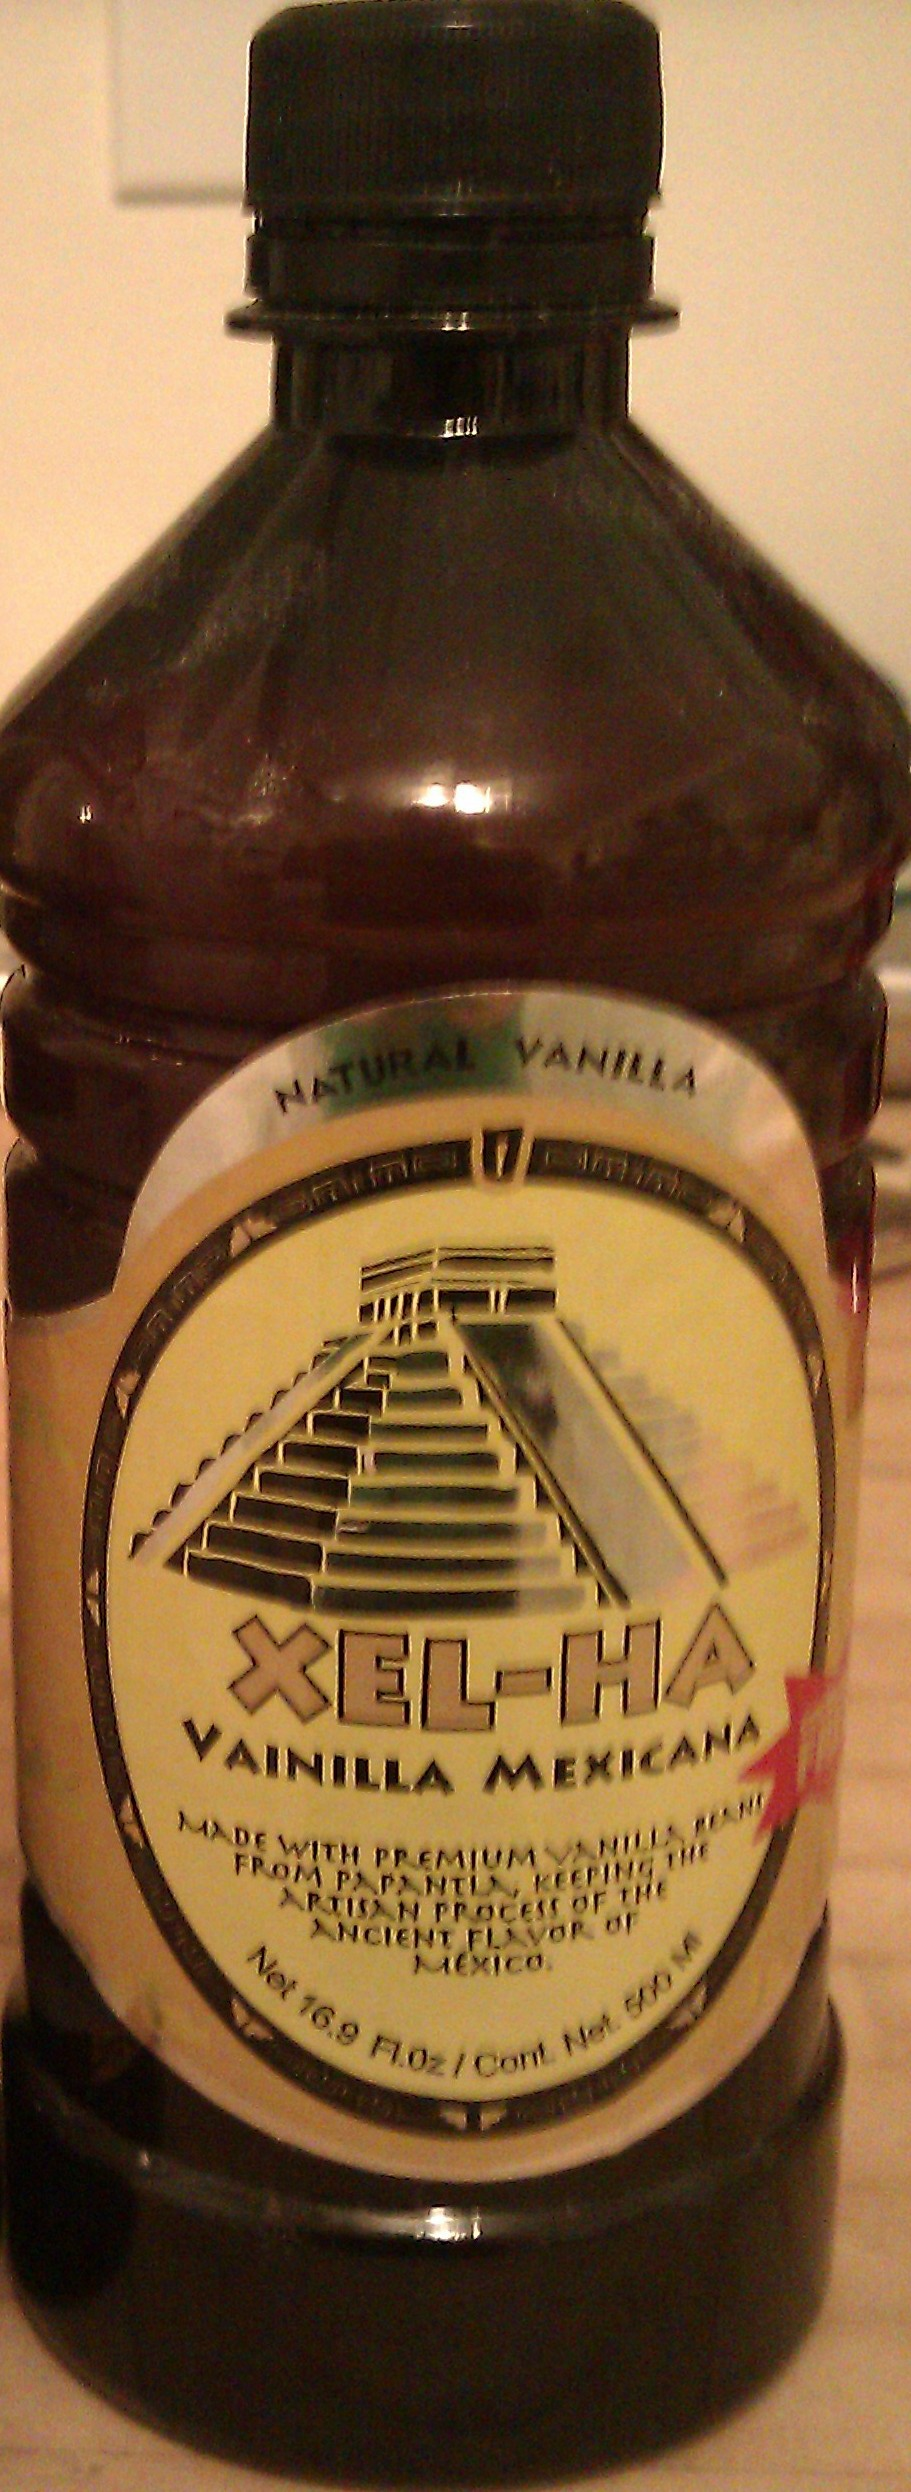 Xel Ha Vainilla Mexicana Natural Clear Vanilla Reviews In